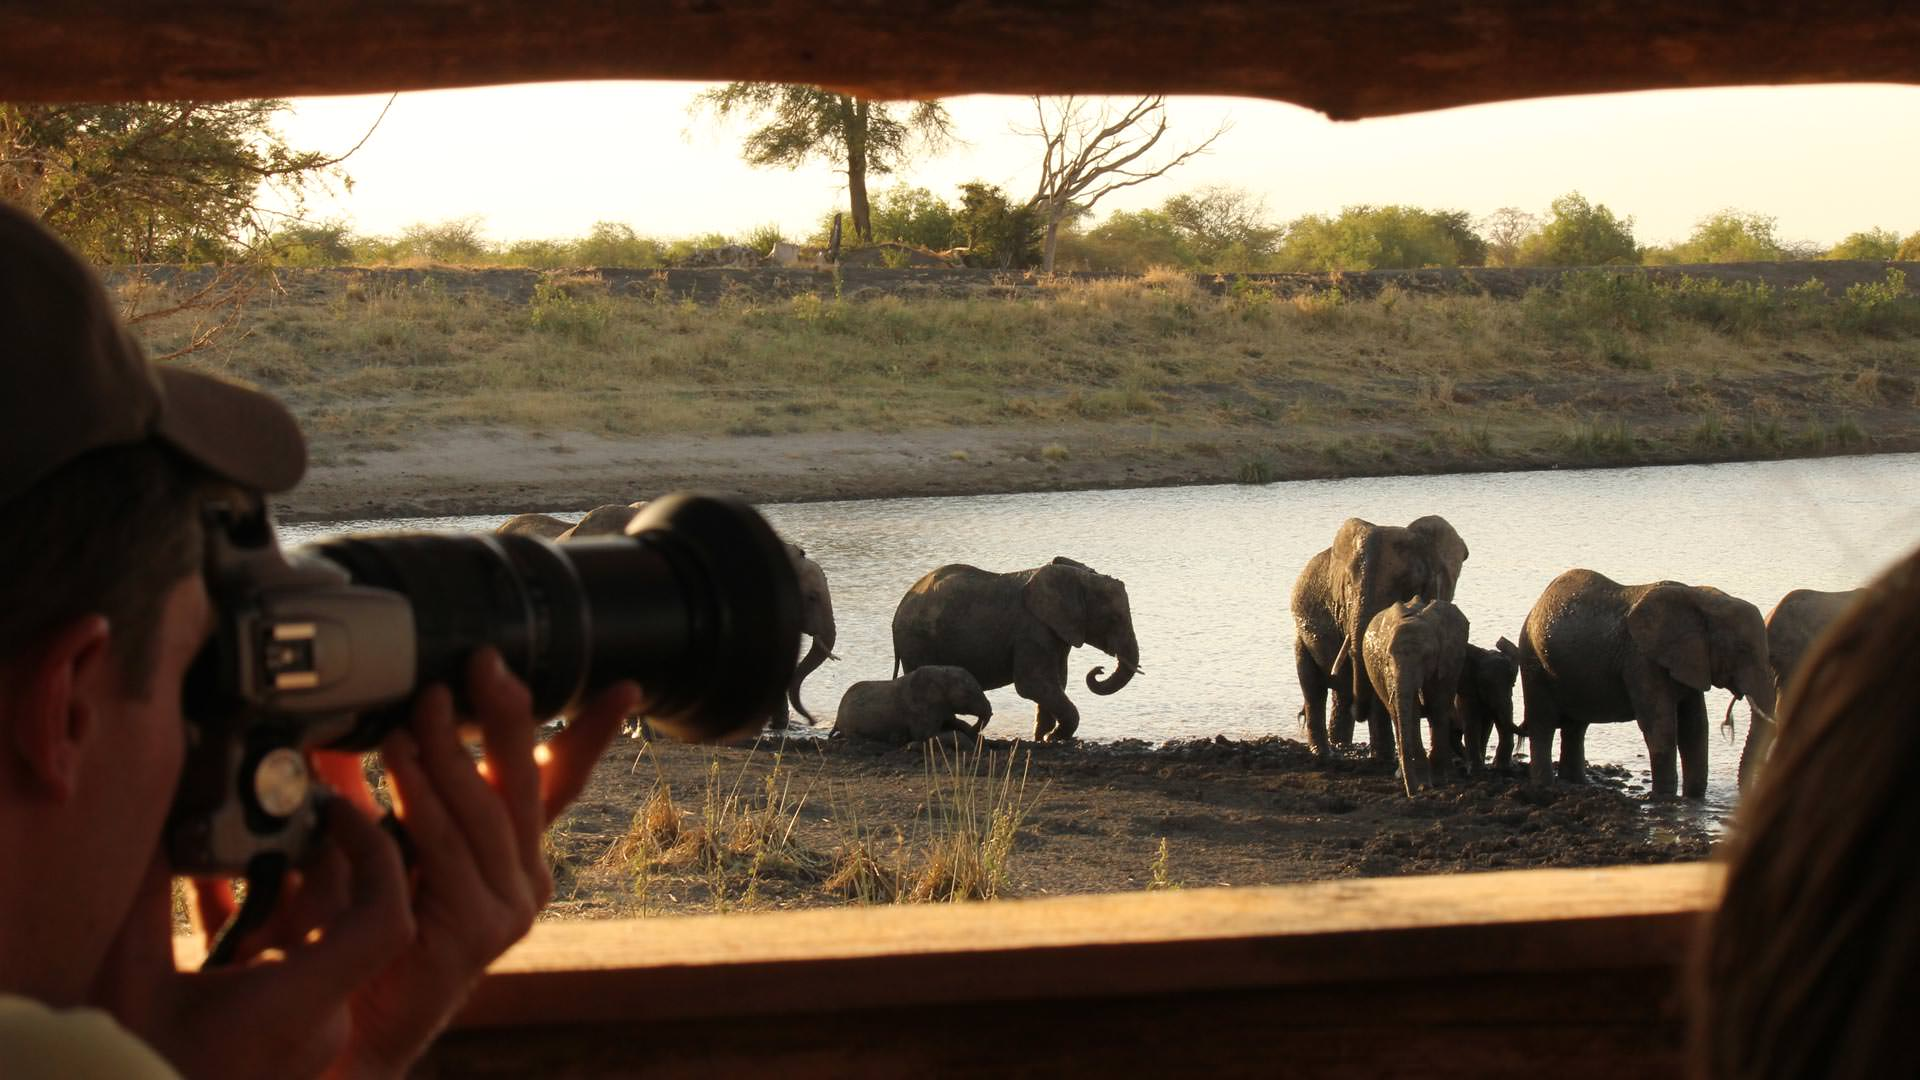 Elephants seen from hide at Manyara Ranch Conservancy